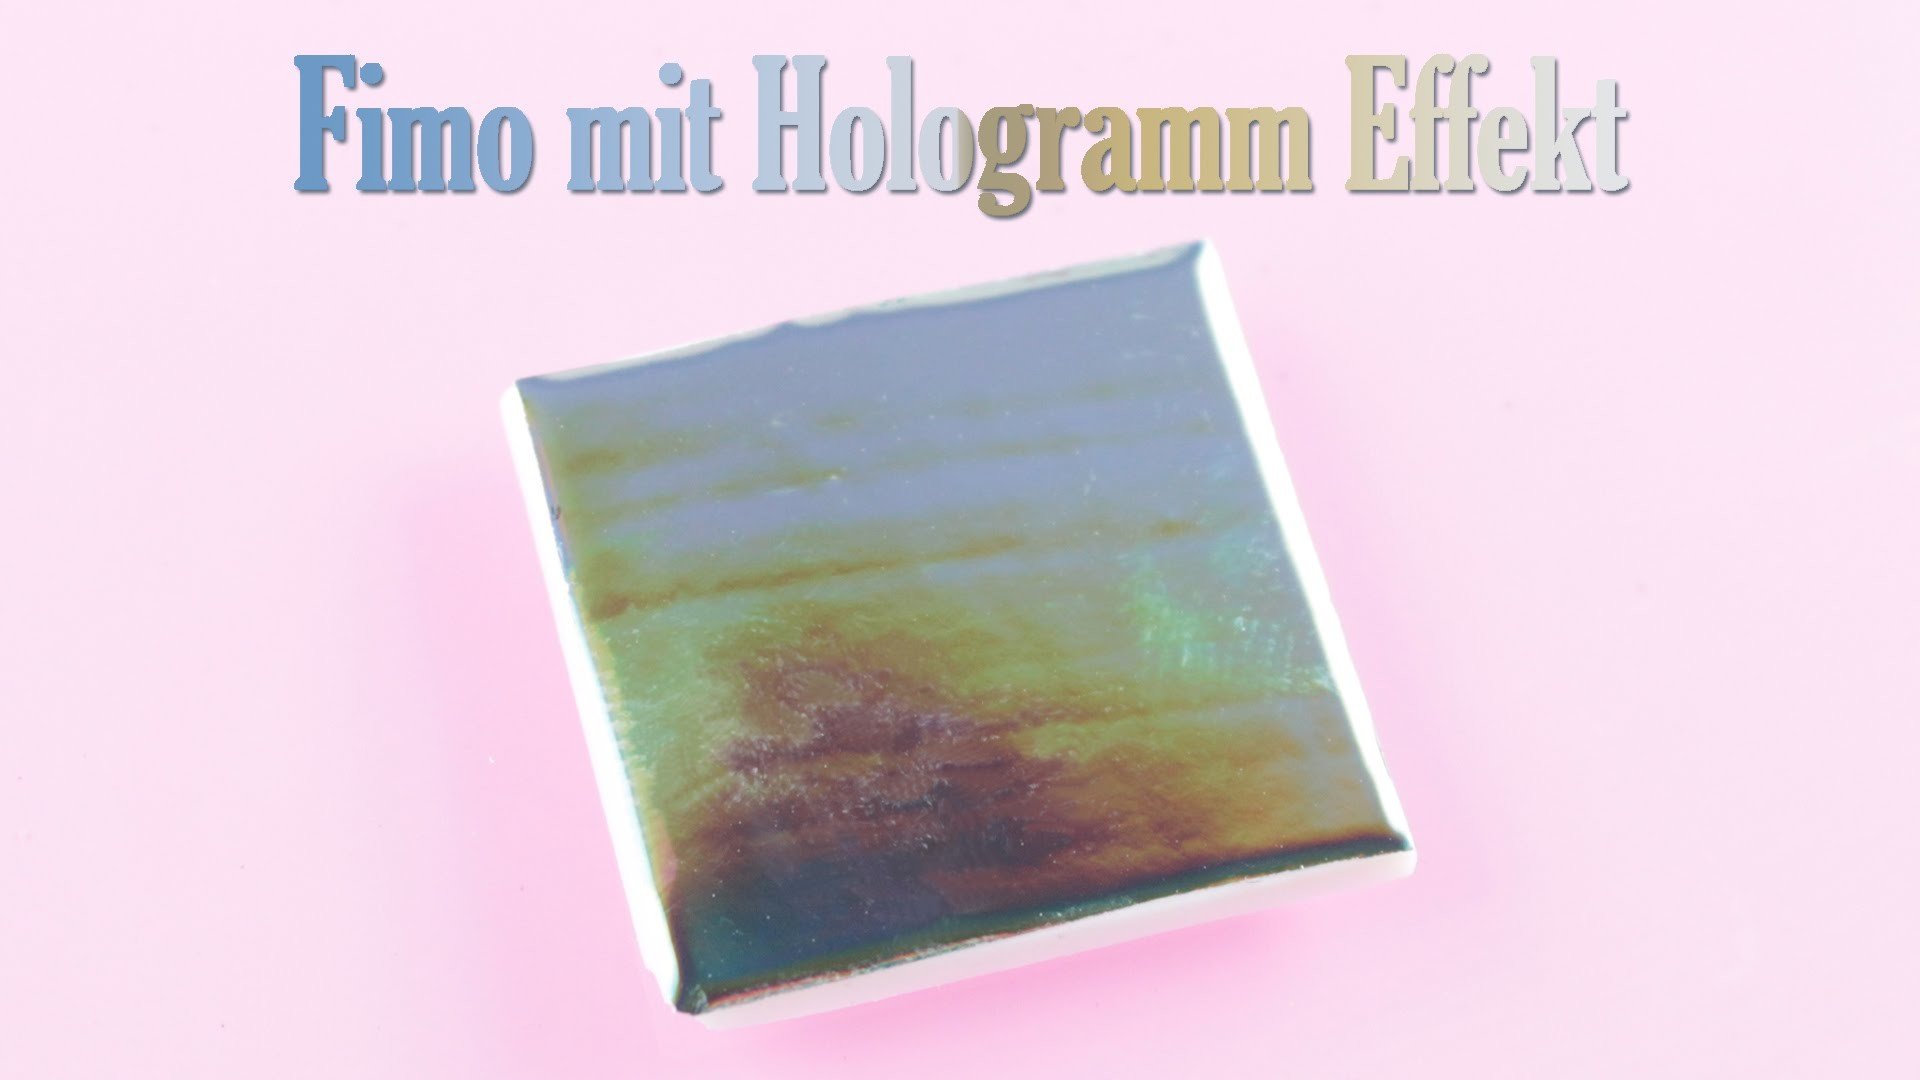 [Fimo Friday] Fimo mit Hologramm Effekt | Polymer Clay | Anielas Fimo